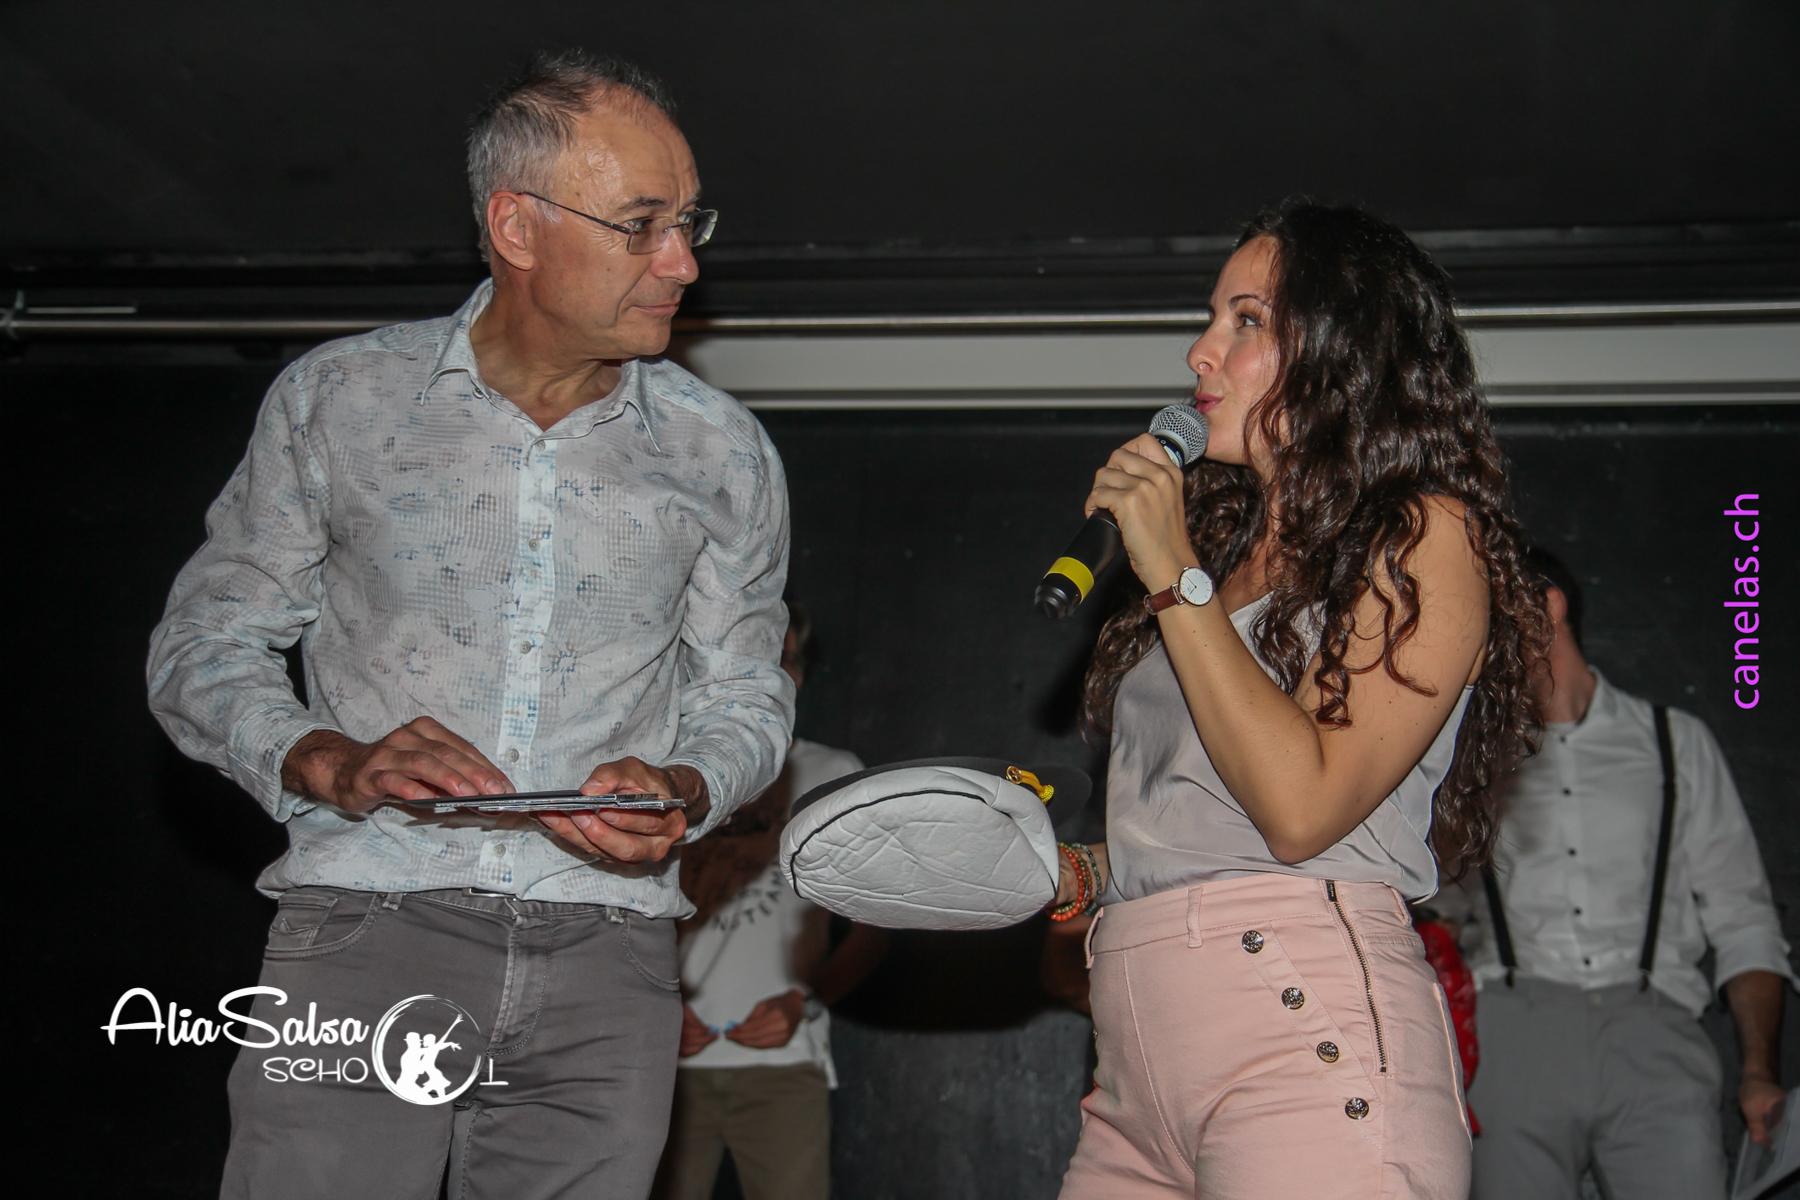 AliaSalsa ecole de danse lausanne soiree bachata salsa cubaineAlia Salsa Soireé Salsa - Bachata-23